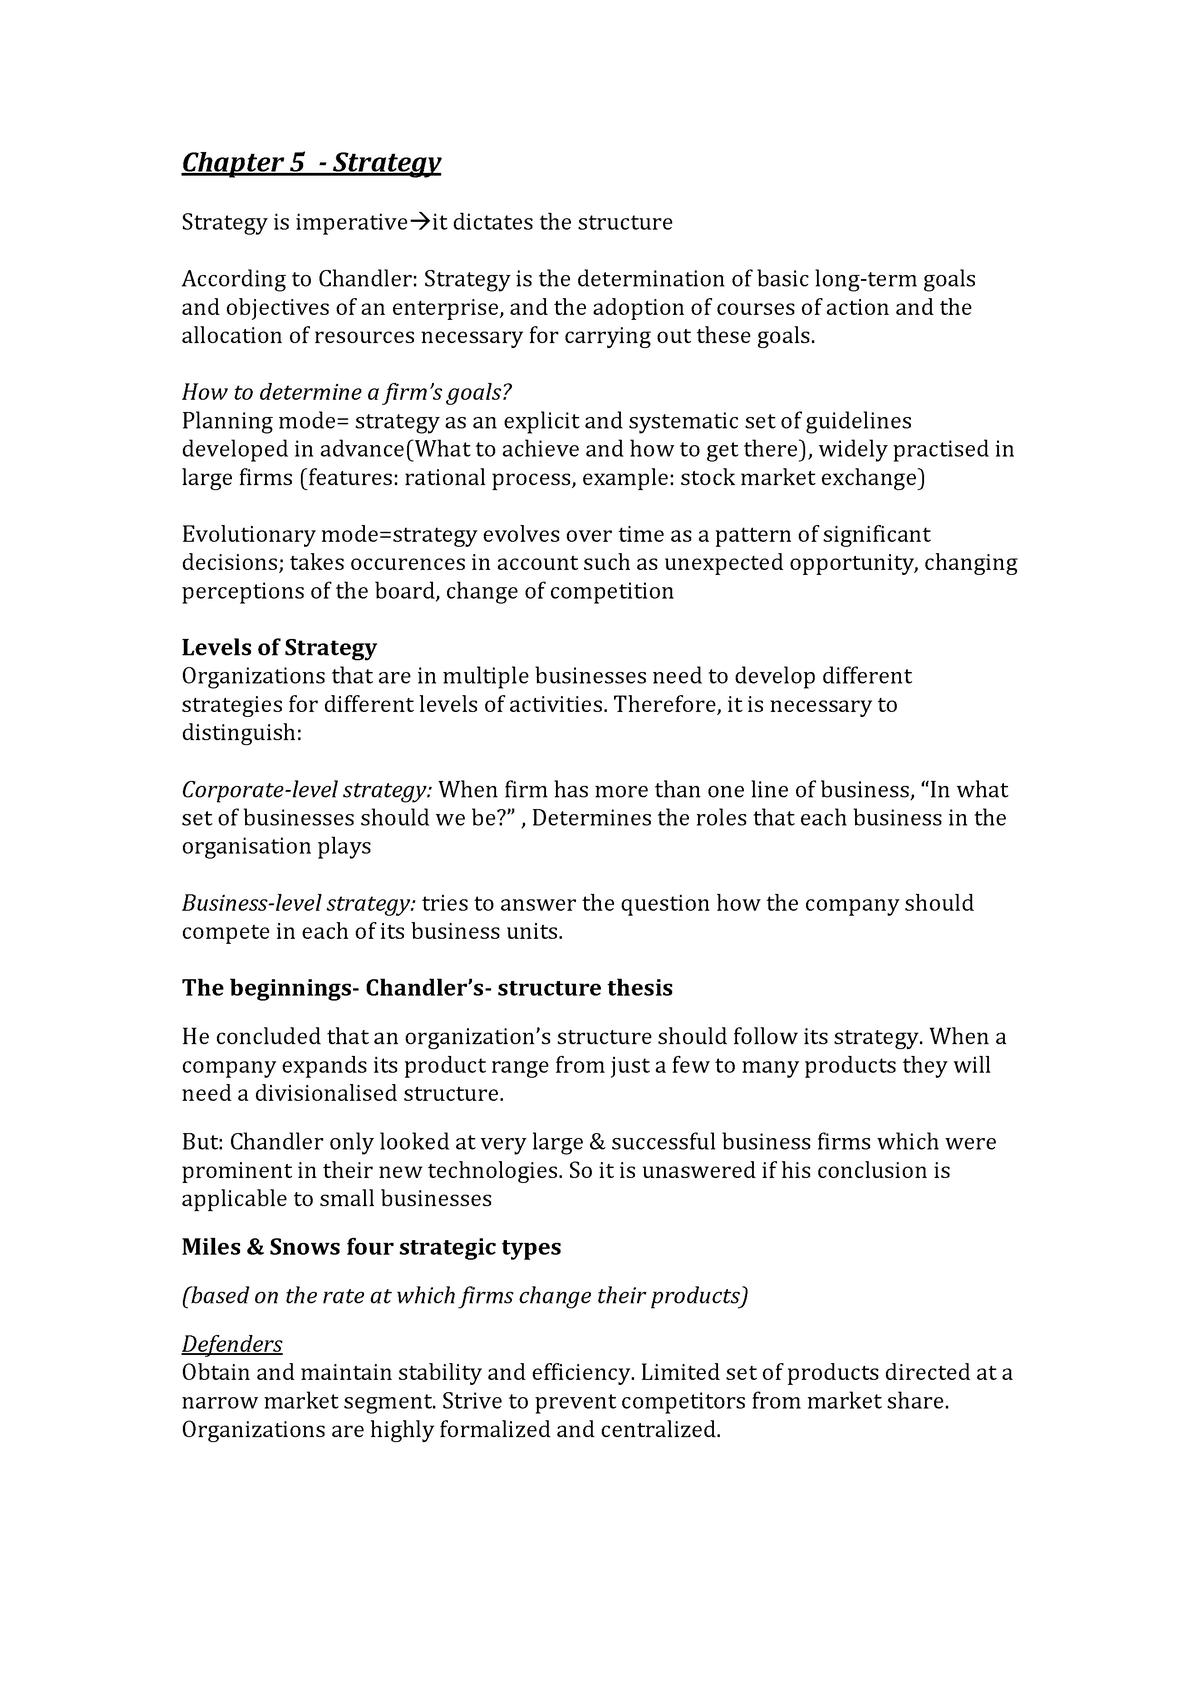 Summary Organizational Structure - Chapter 5 - EBP670C05